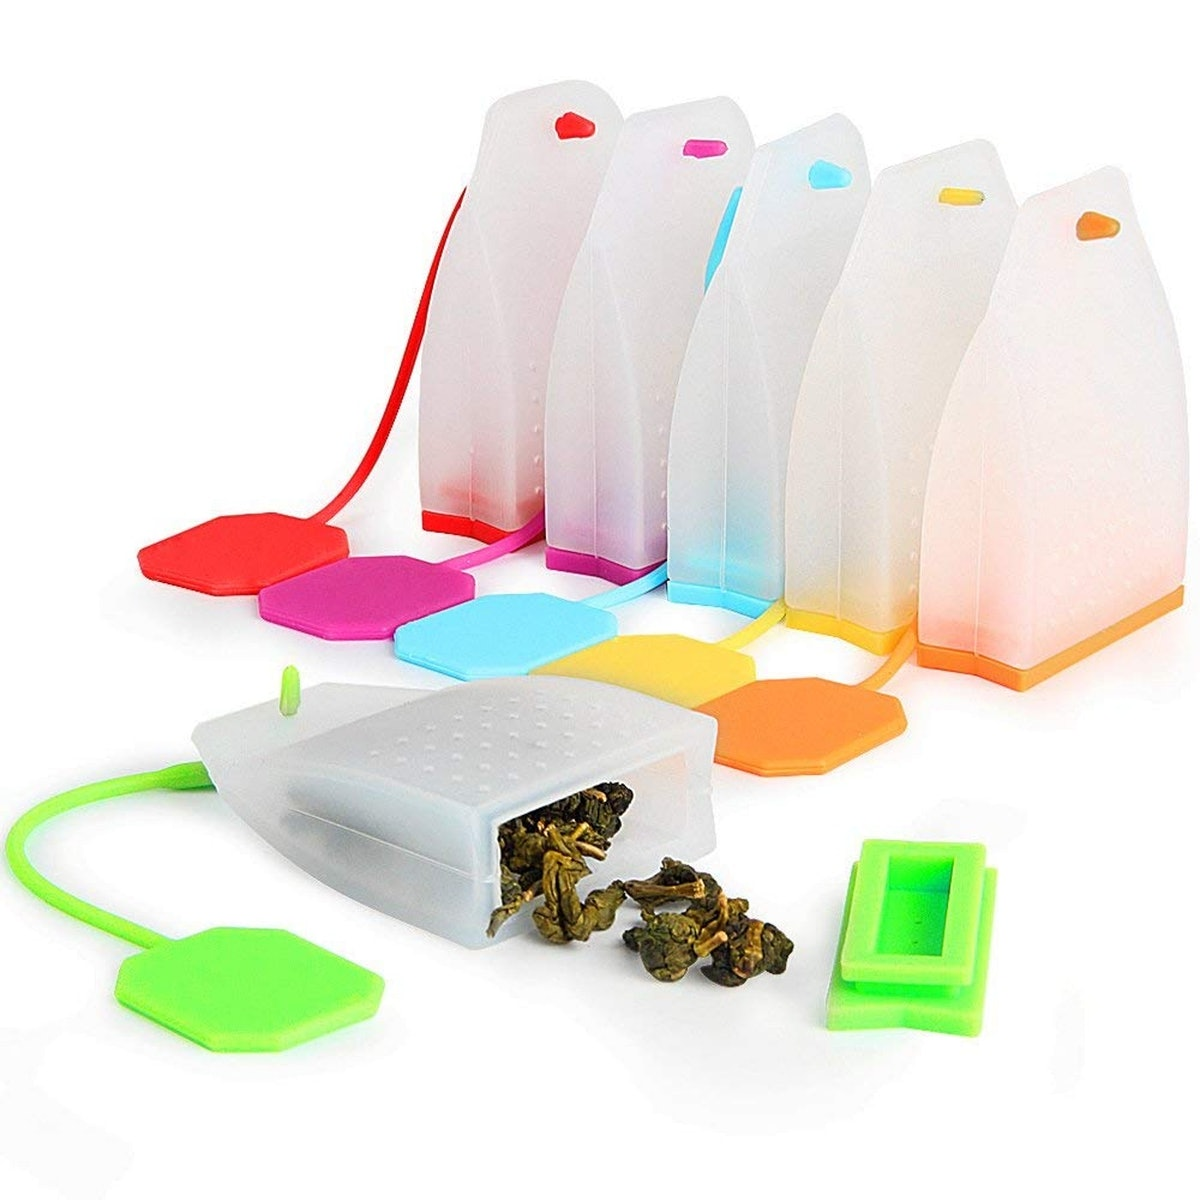 FineGood Tea Infuser (6-Pack)